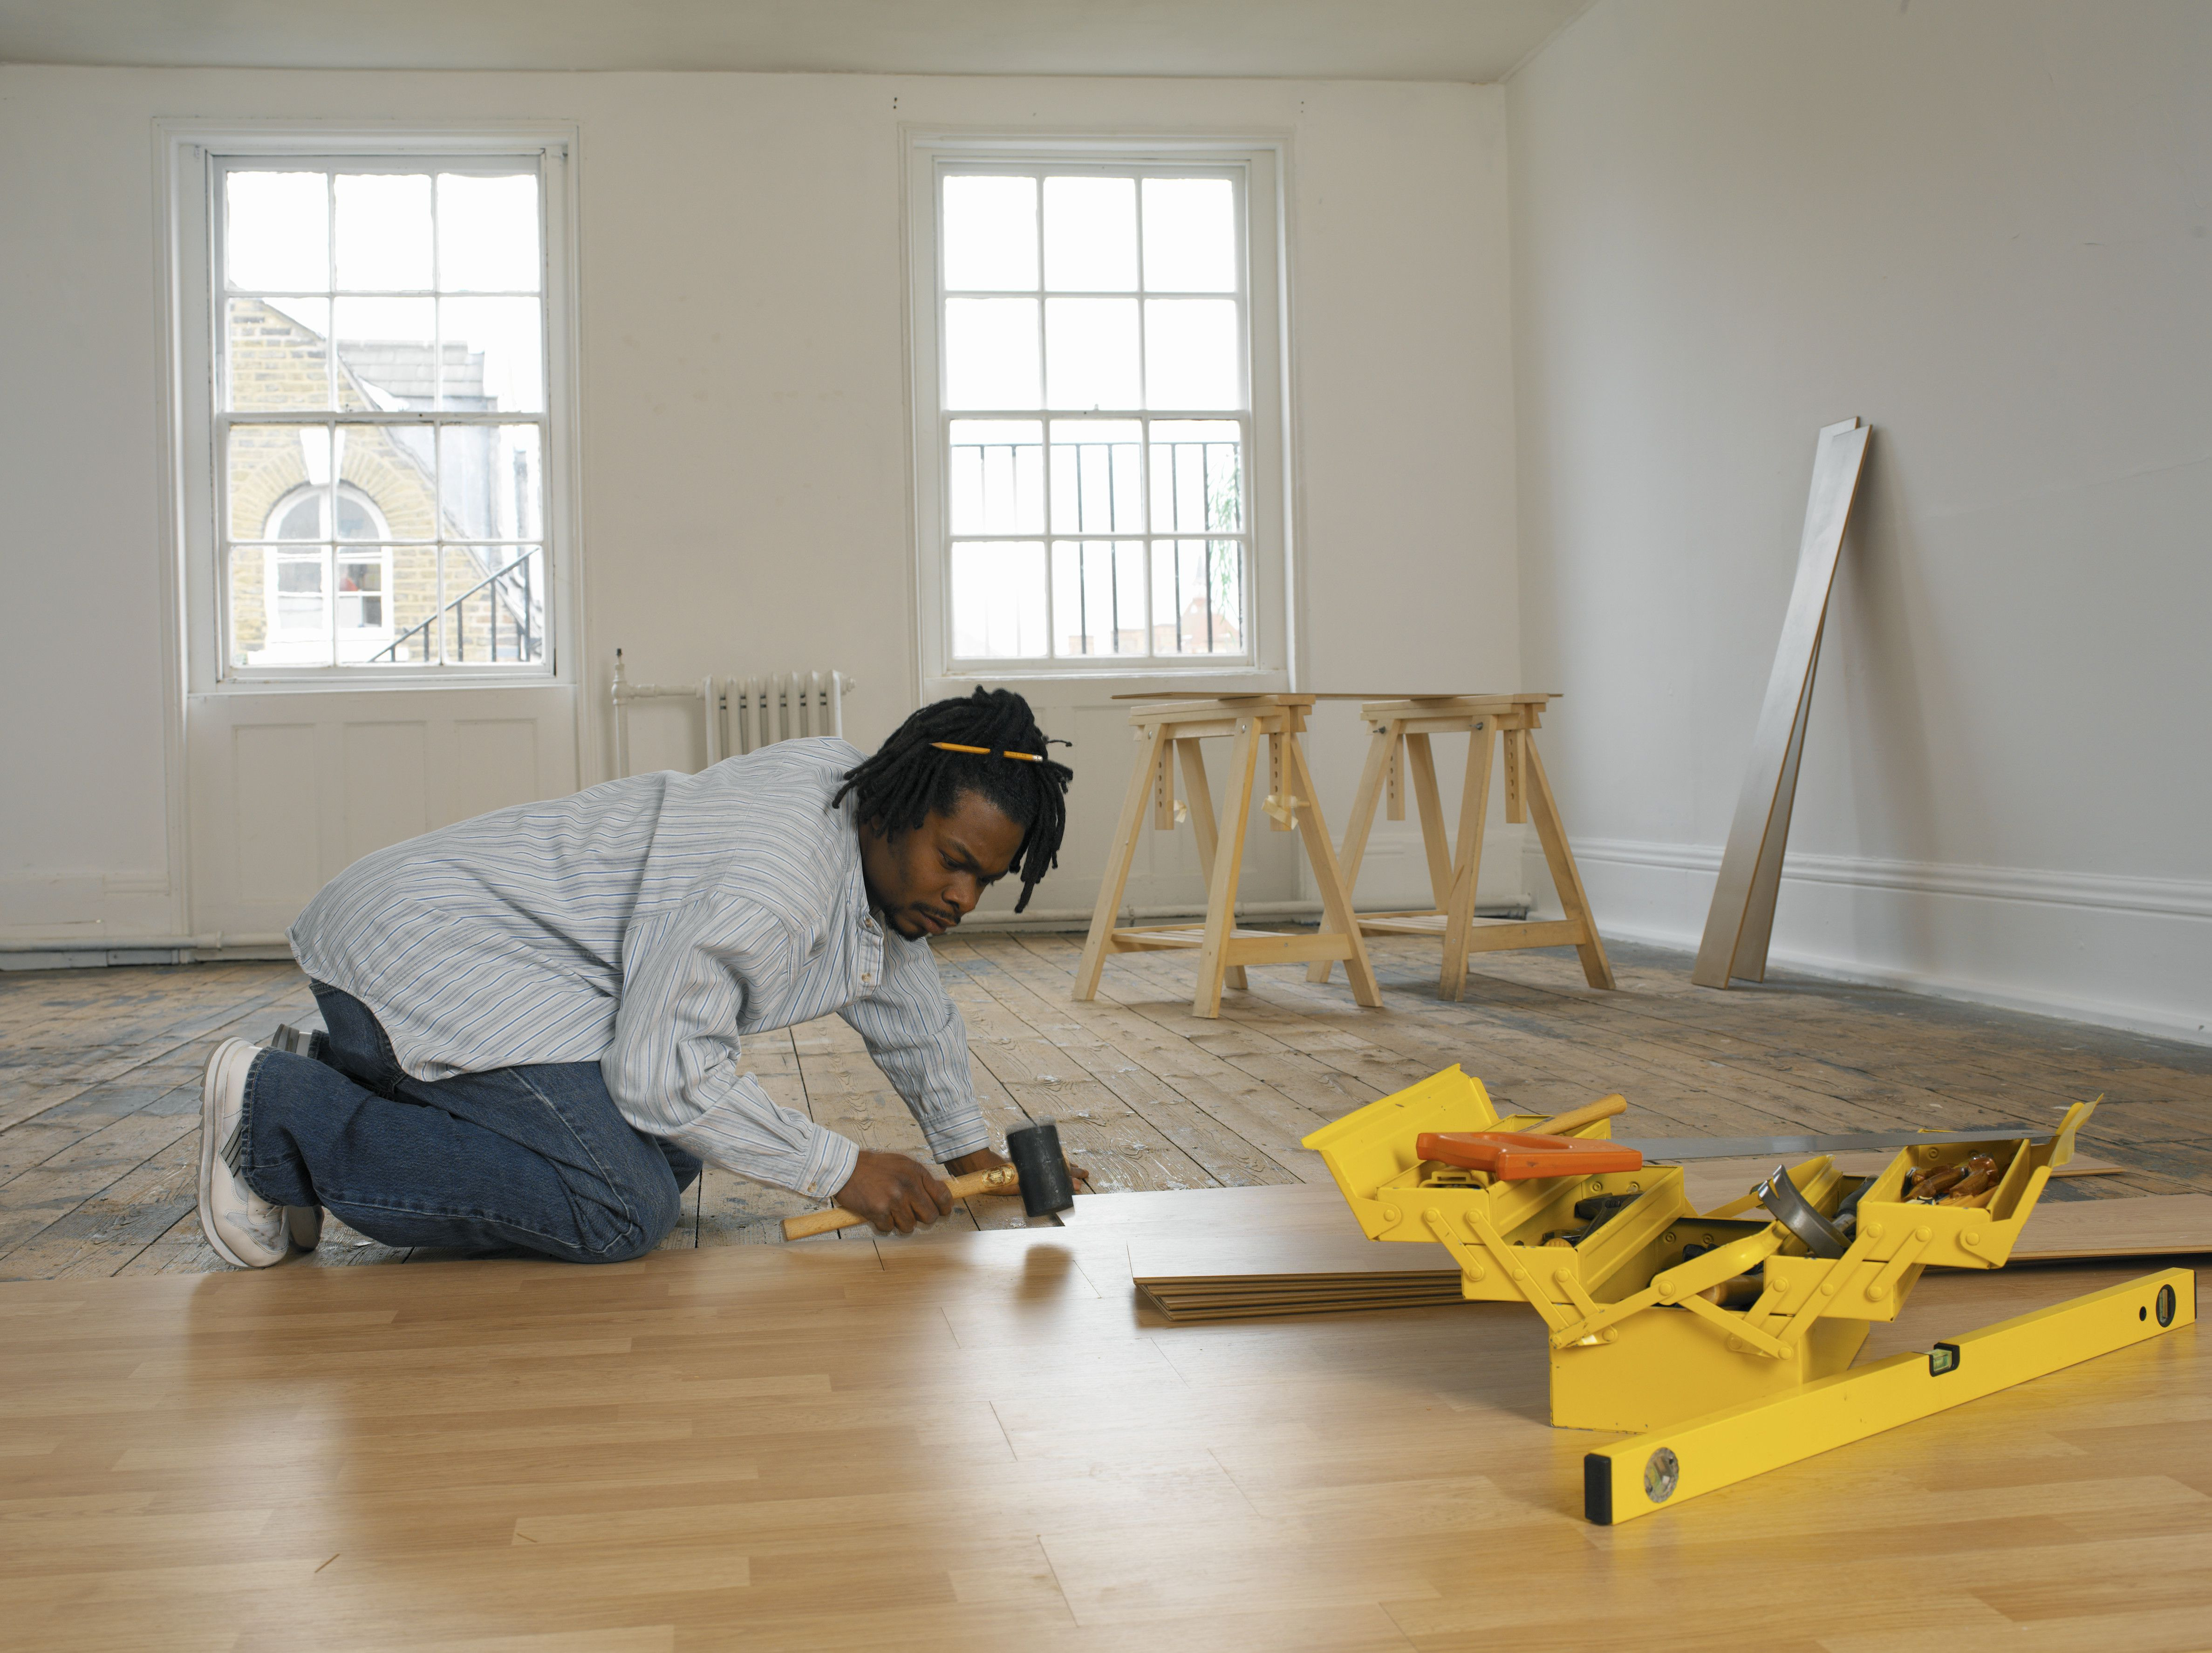 home depot hickory hardwood flooring of major manufacturing brands for laminate flooring regarding laying laminate flooring